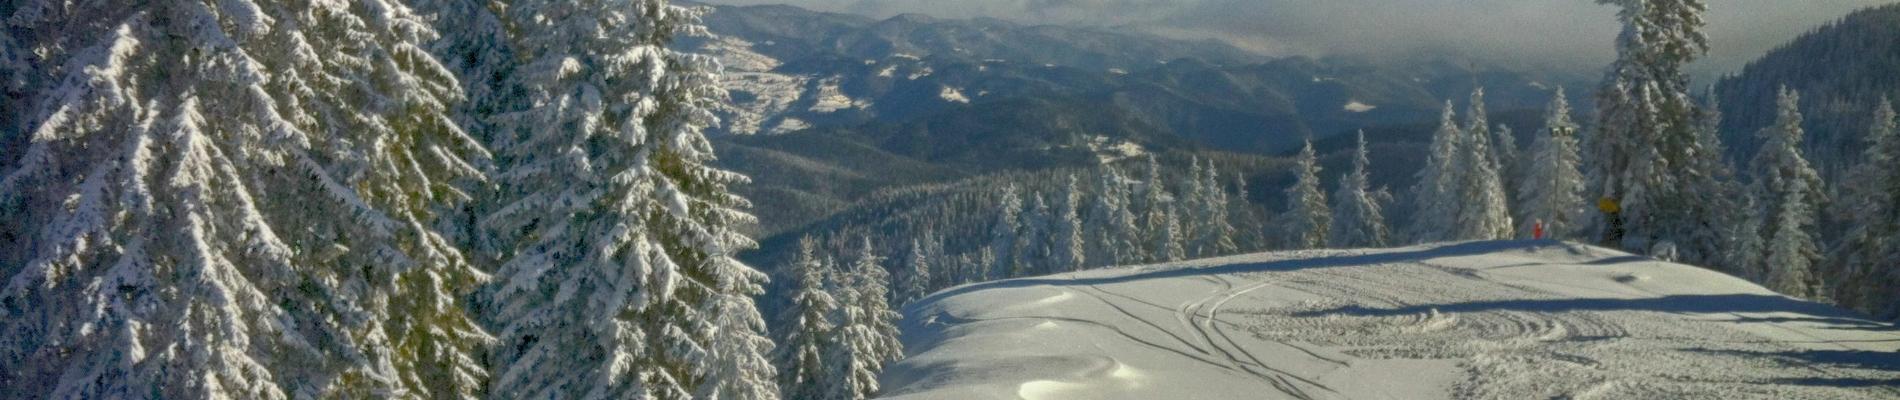 SnowScene1